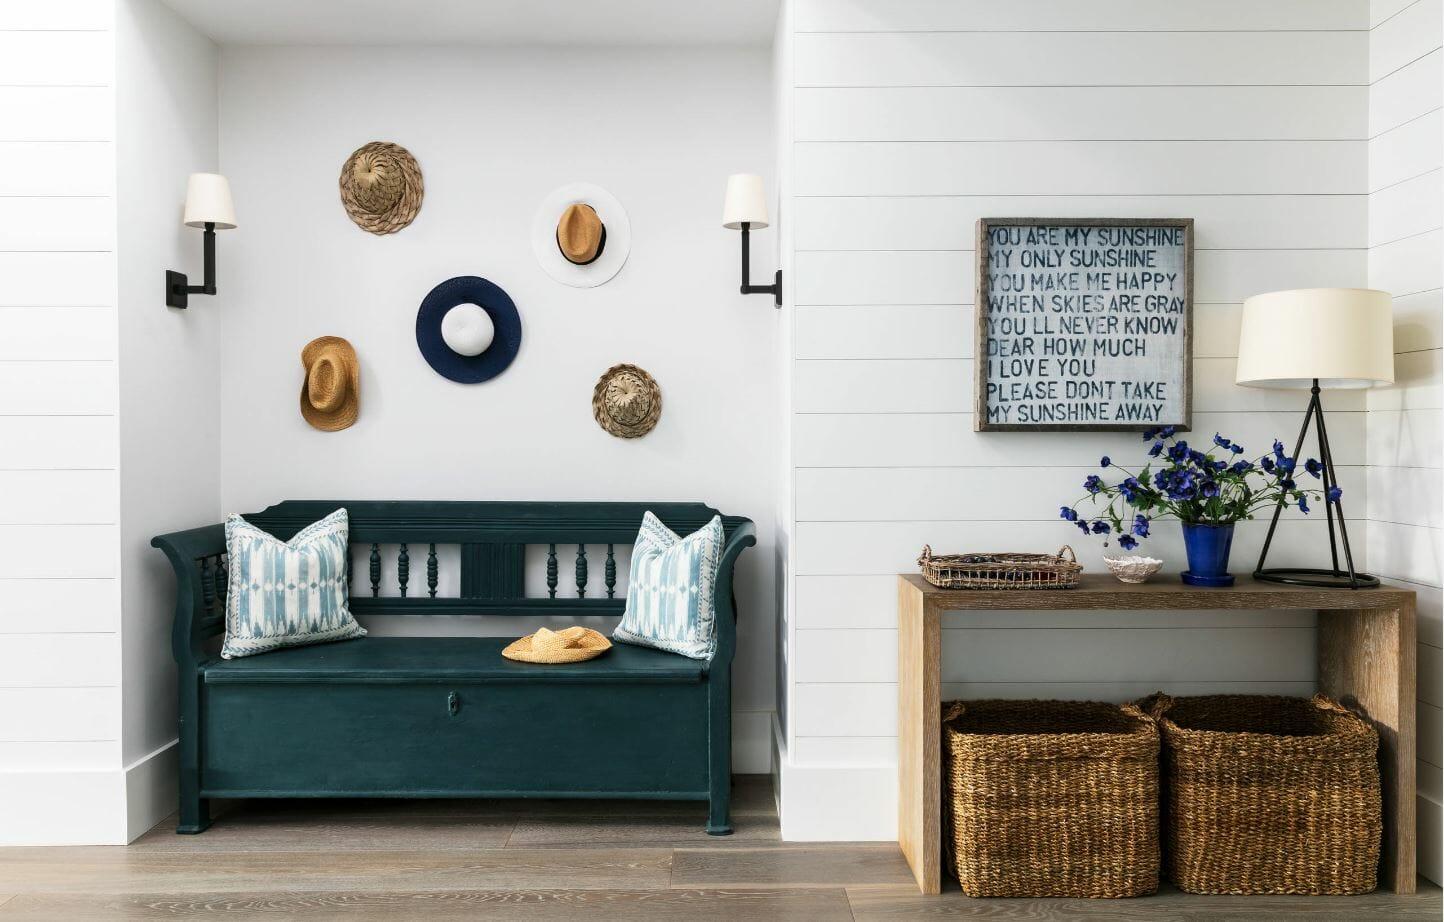 Designer tips 7 creative hallway decorating ideas decorilla